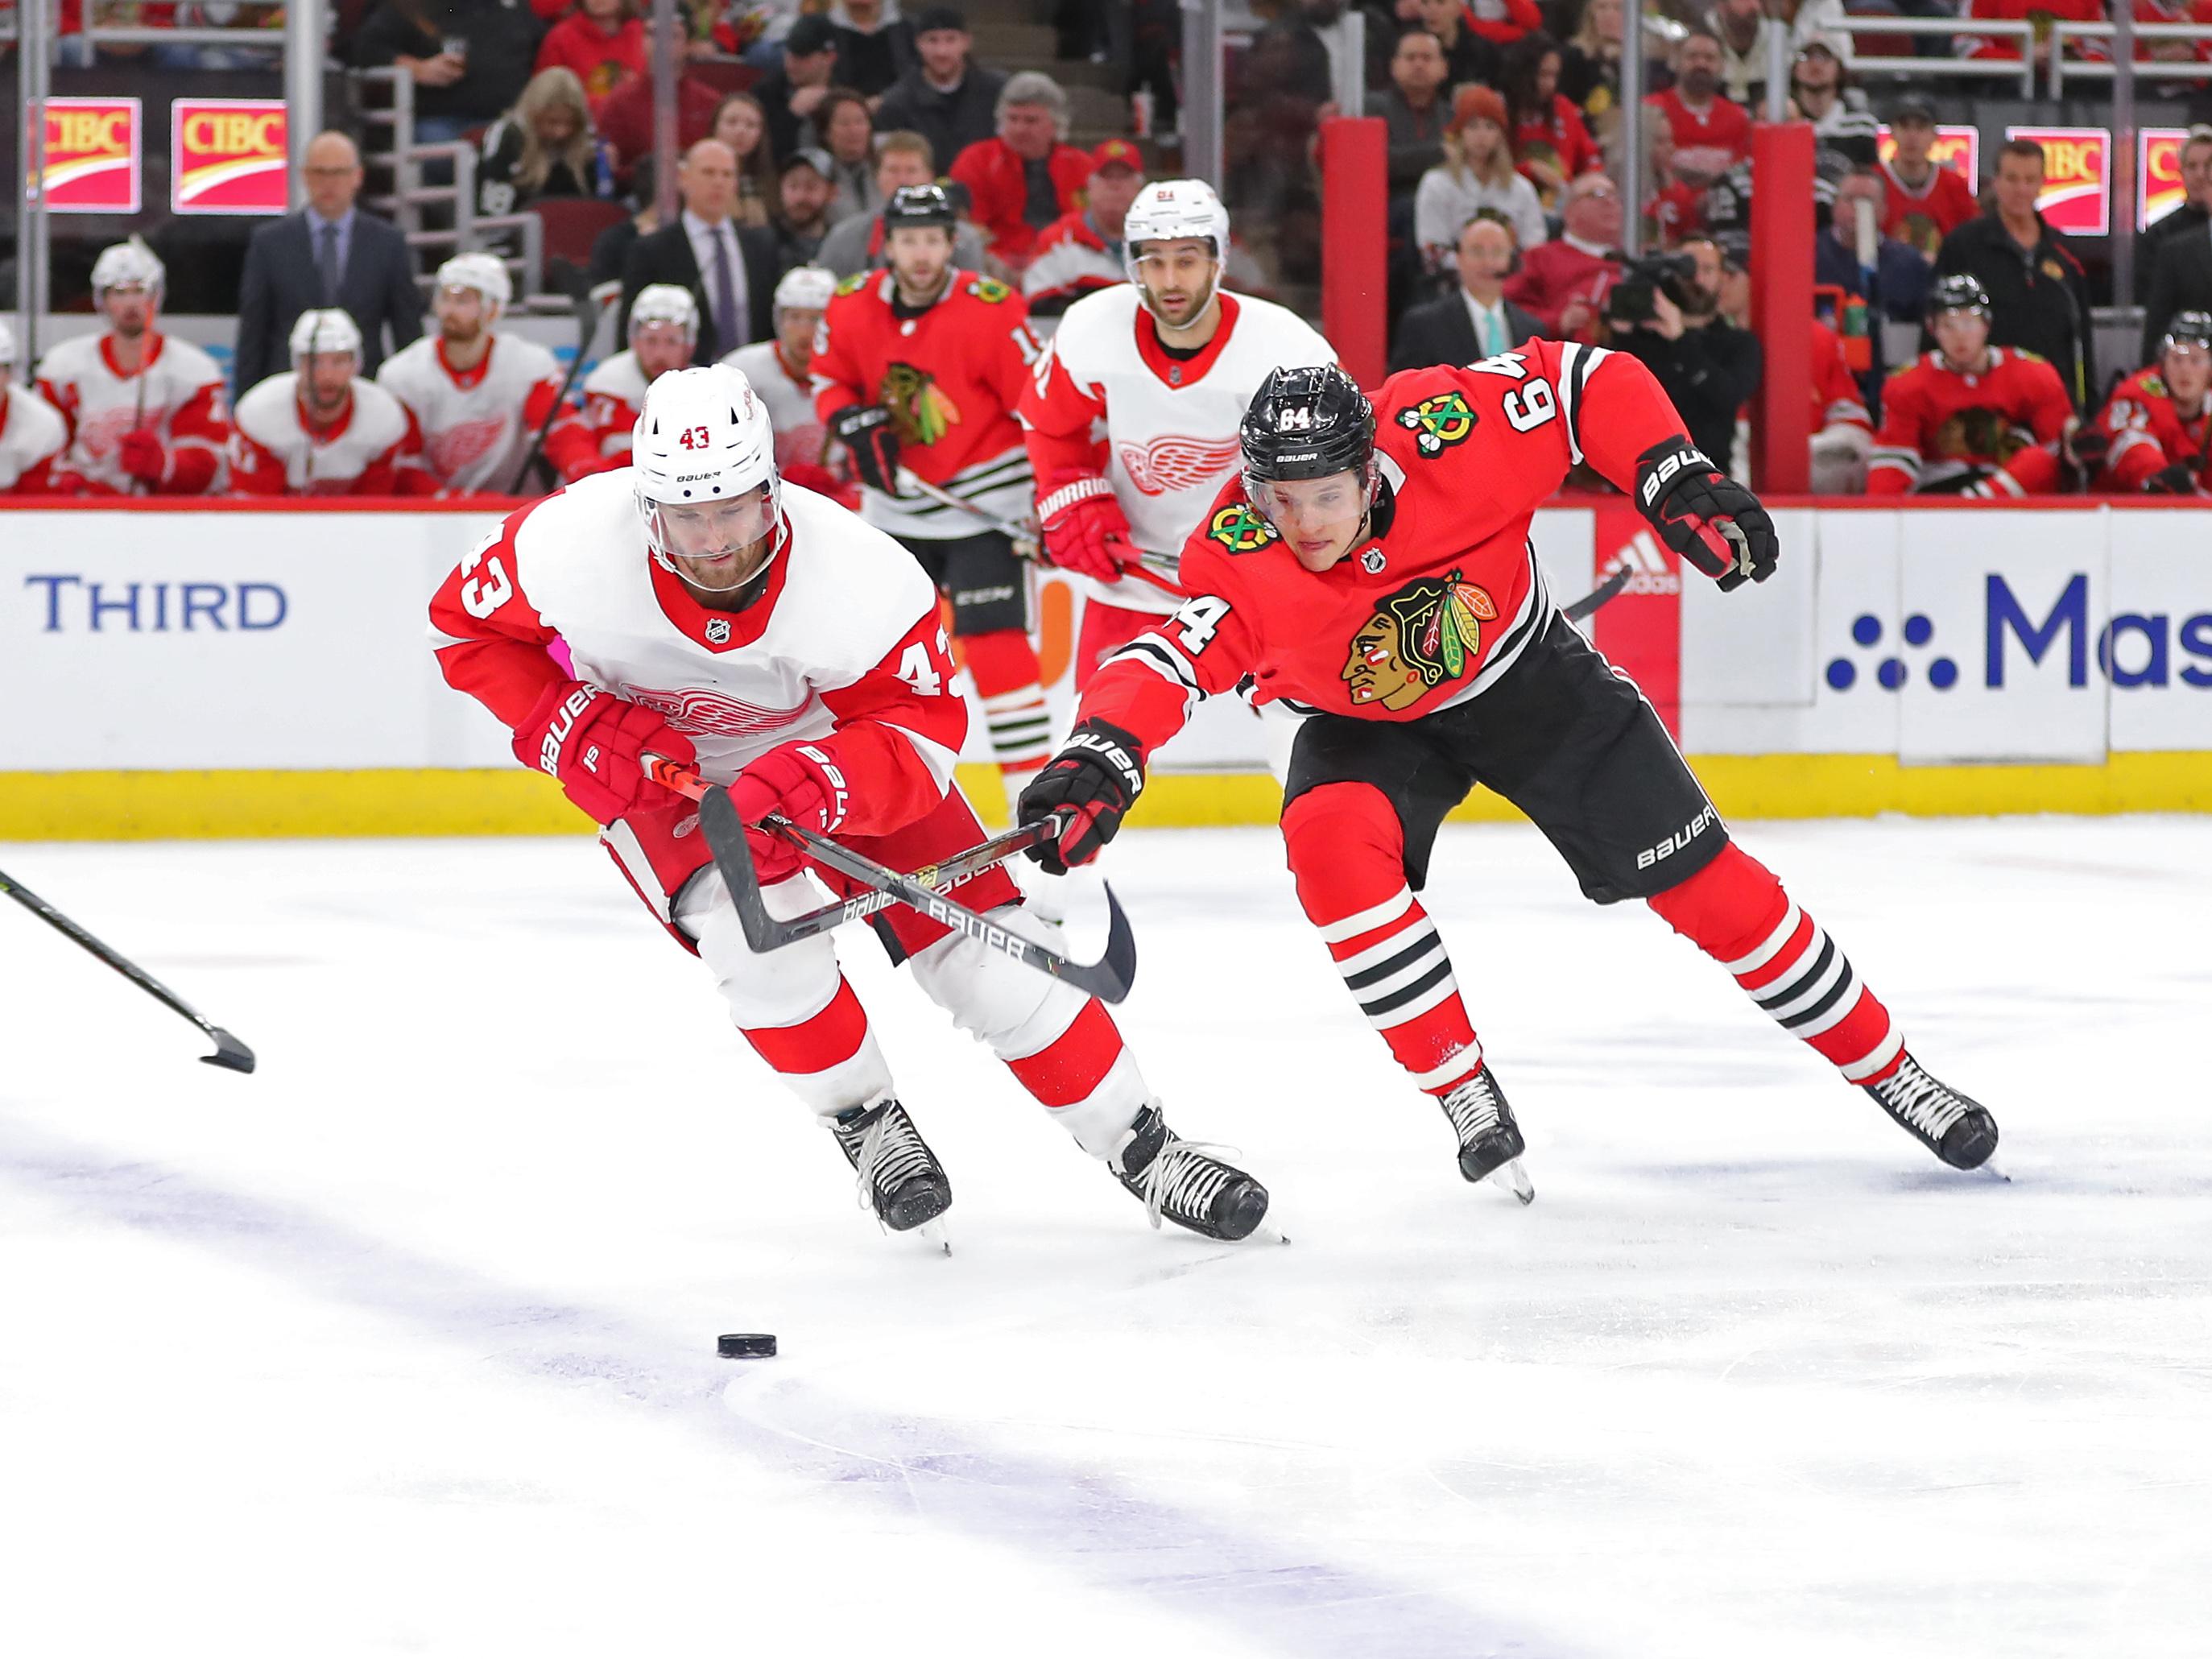 NHL: Detroit Red Wings at Chicago Blackhawks